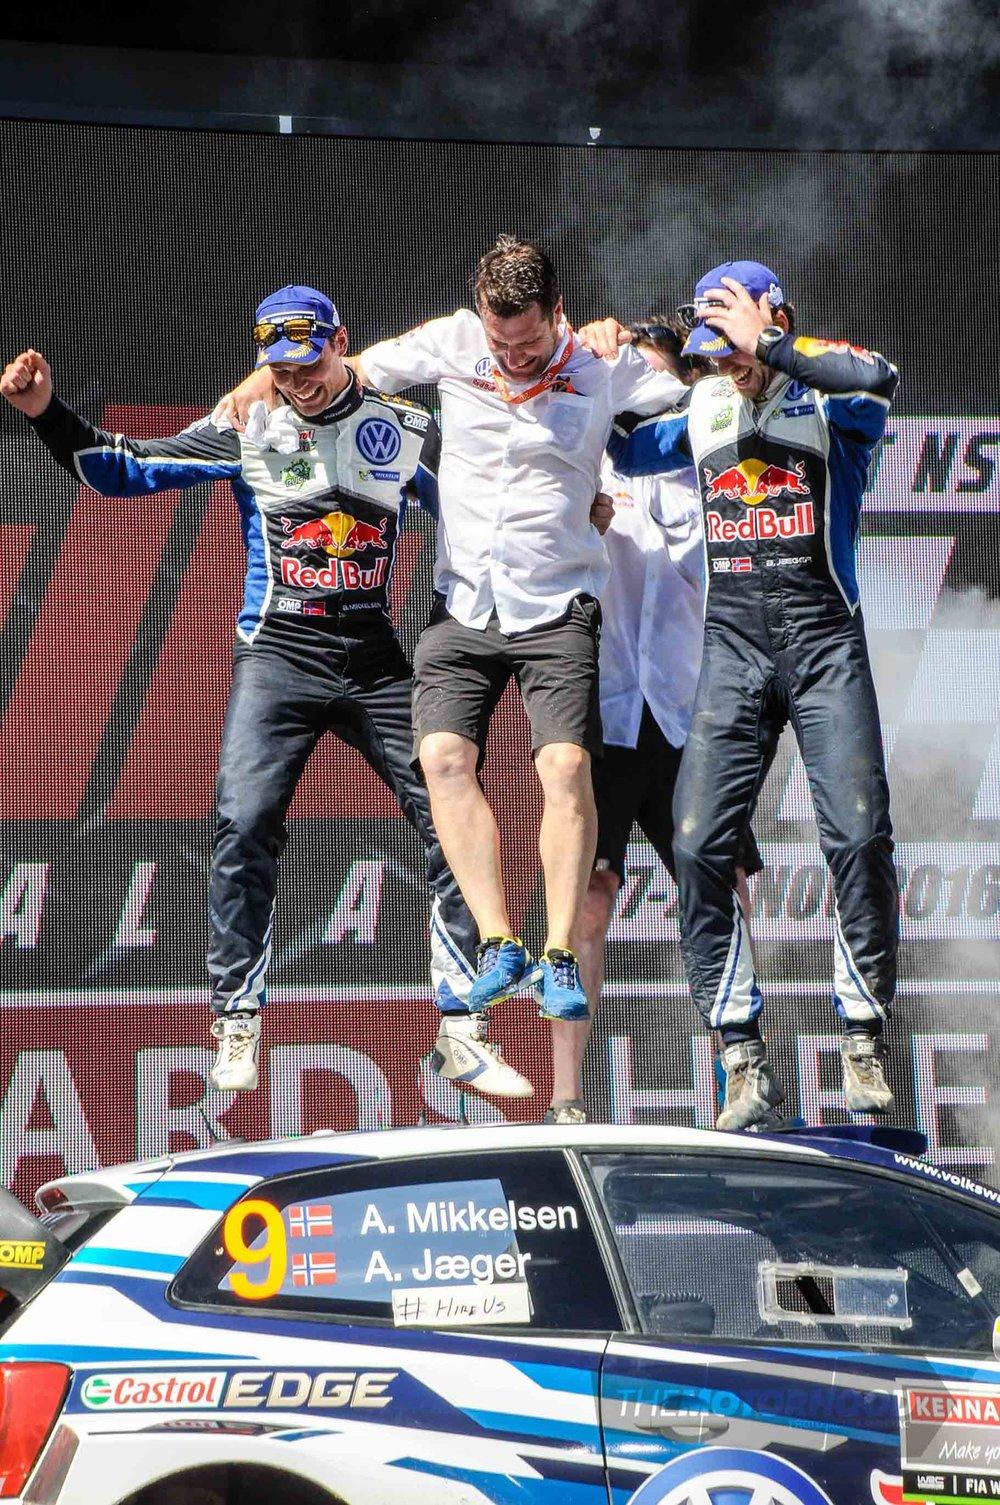 WRC-Aus-16_ALANA-MCISAAC_LRW-1355.jpg